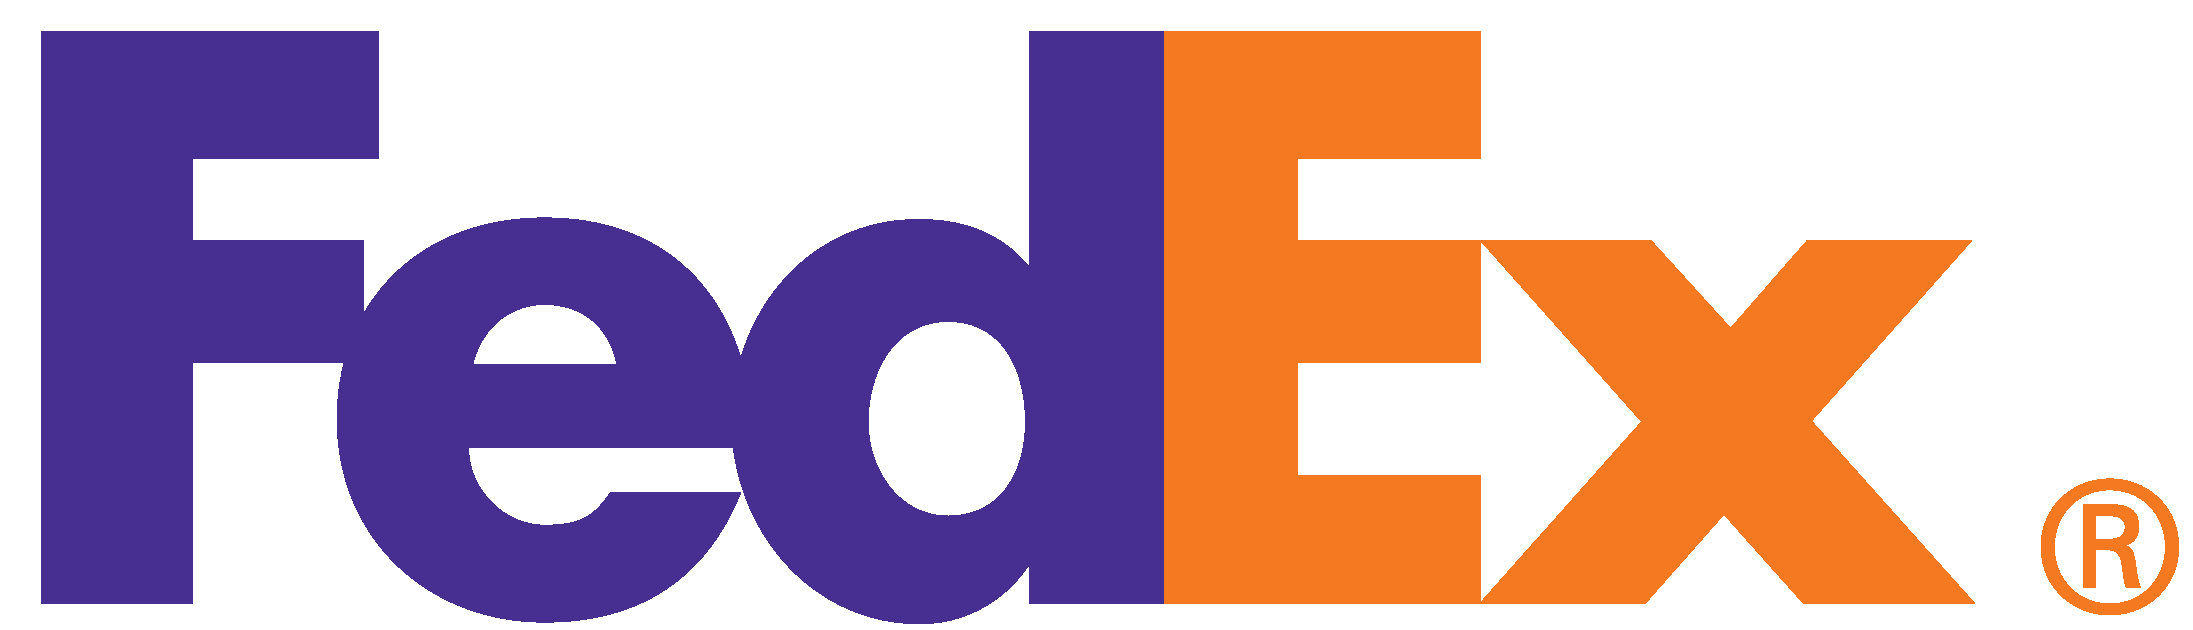 fedex_express_logo_2.png